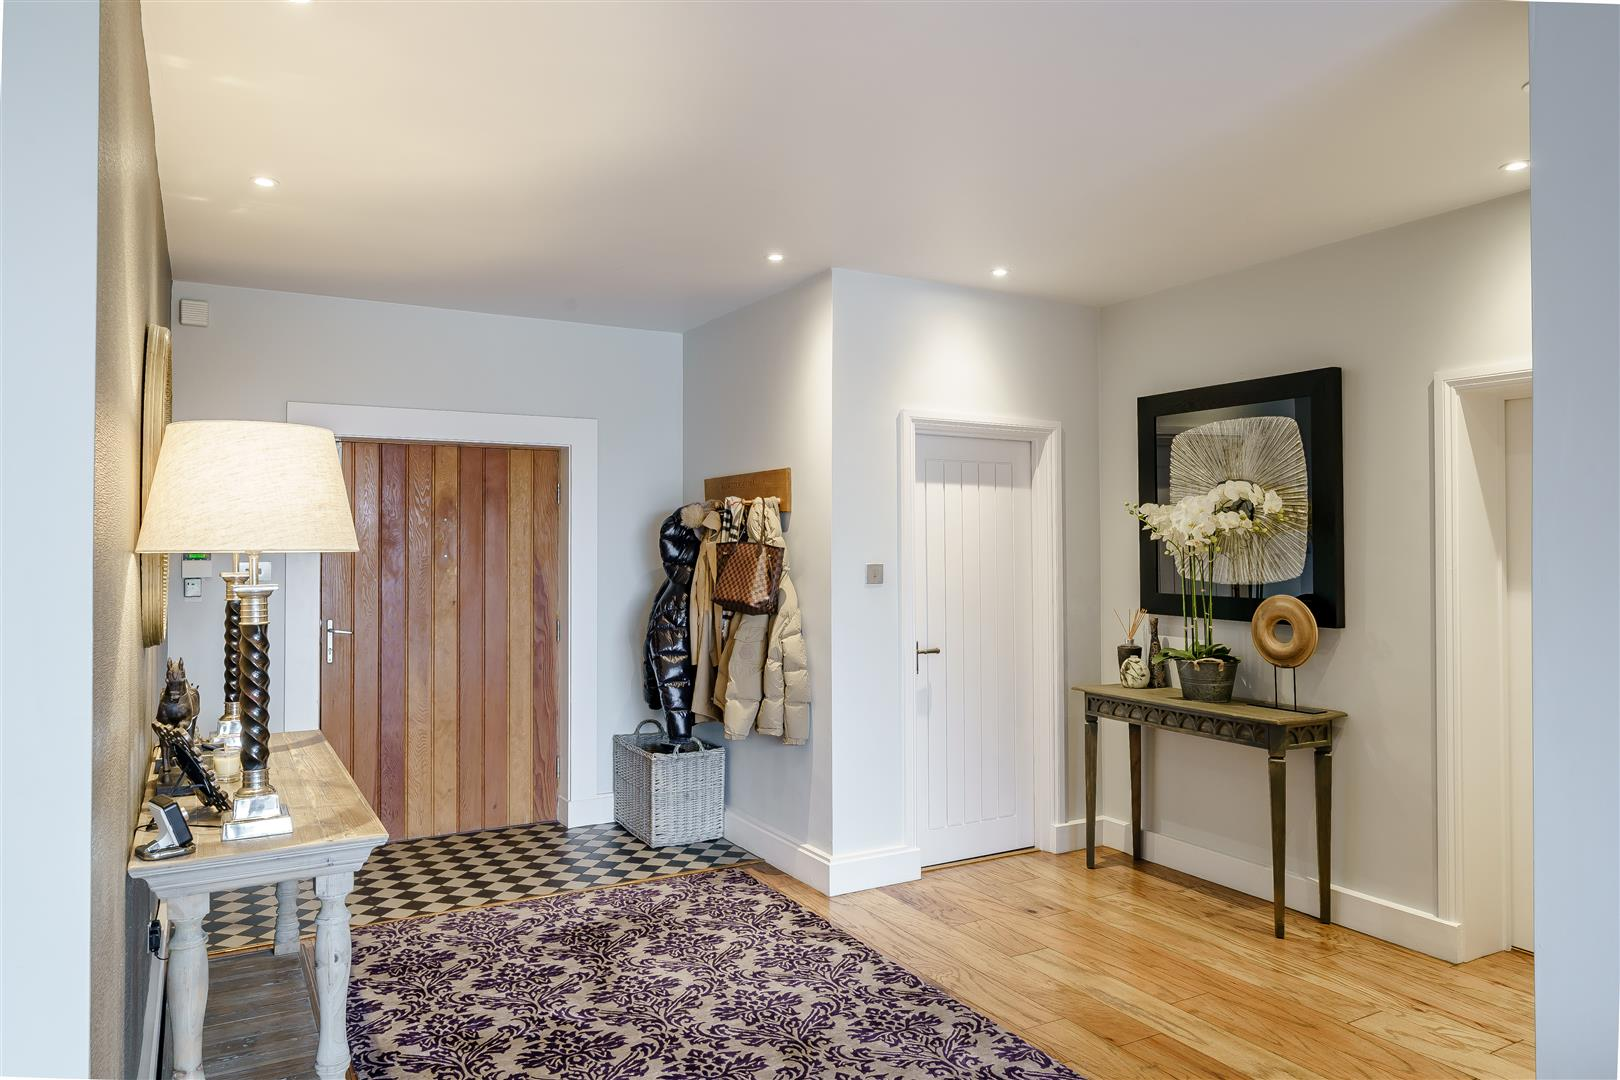 Rowstock Manor - Gallery Image 03 - Hallway